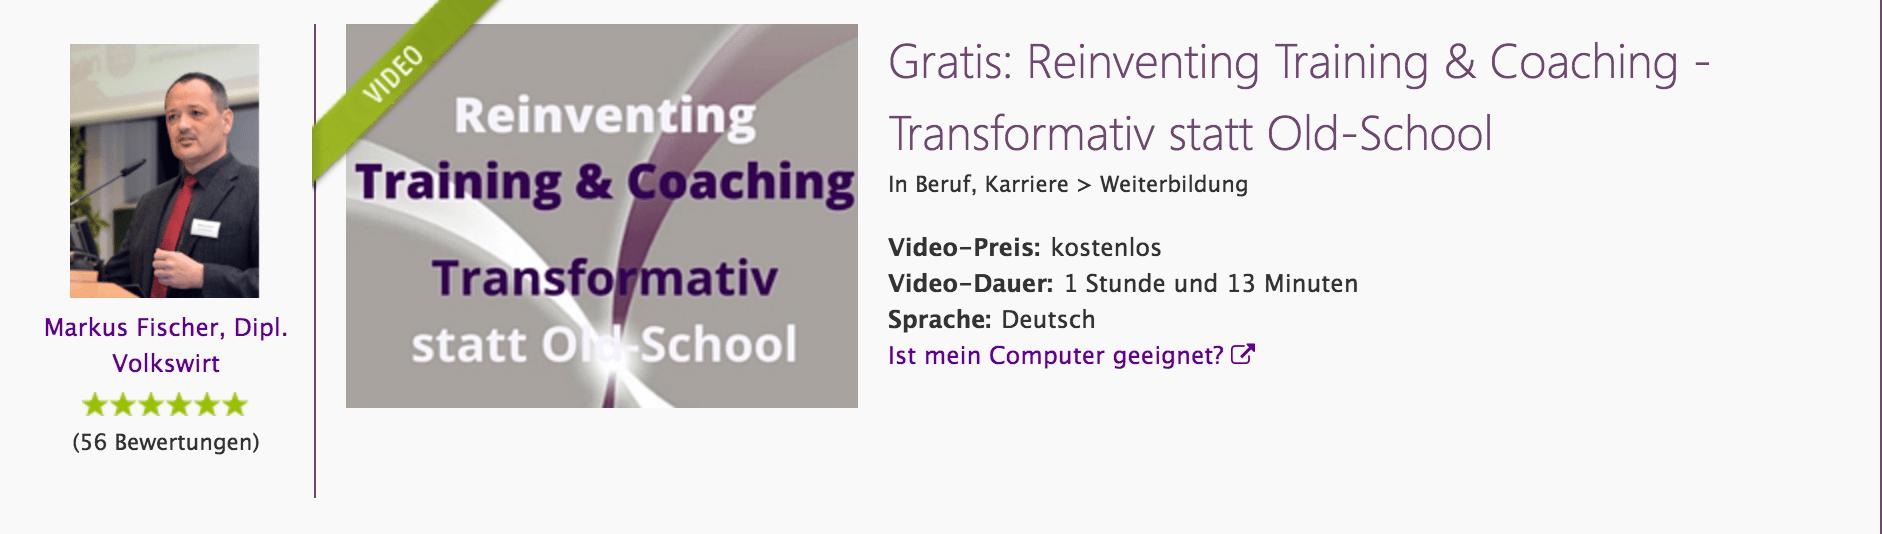 Videokurs Reinventing Training & Coaching, 1h, kostenfrei